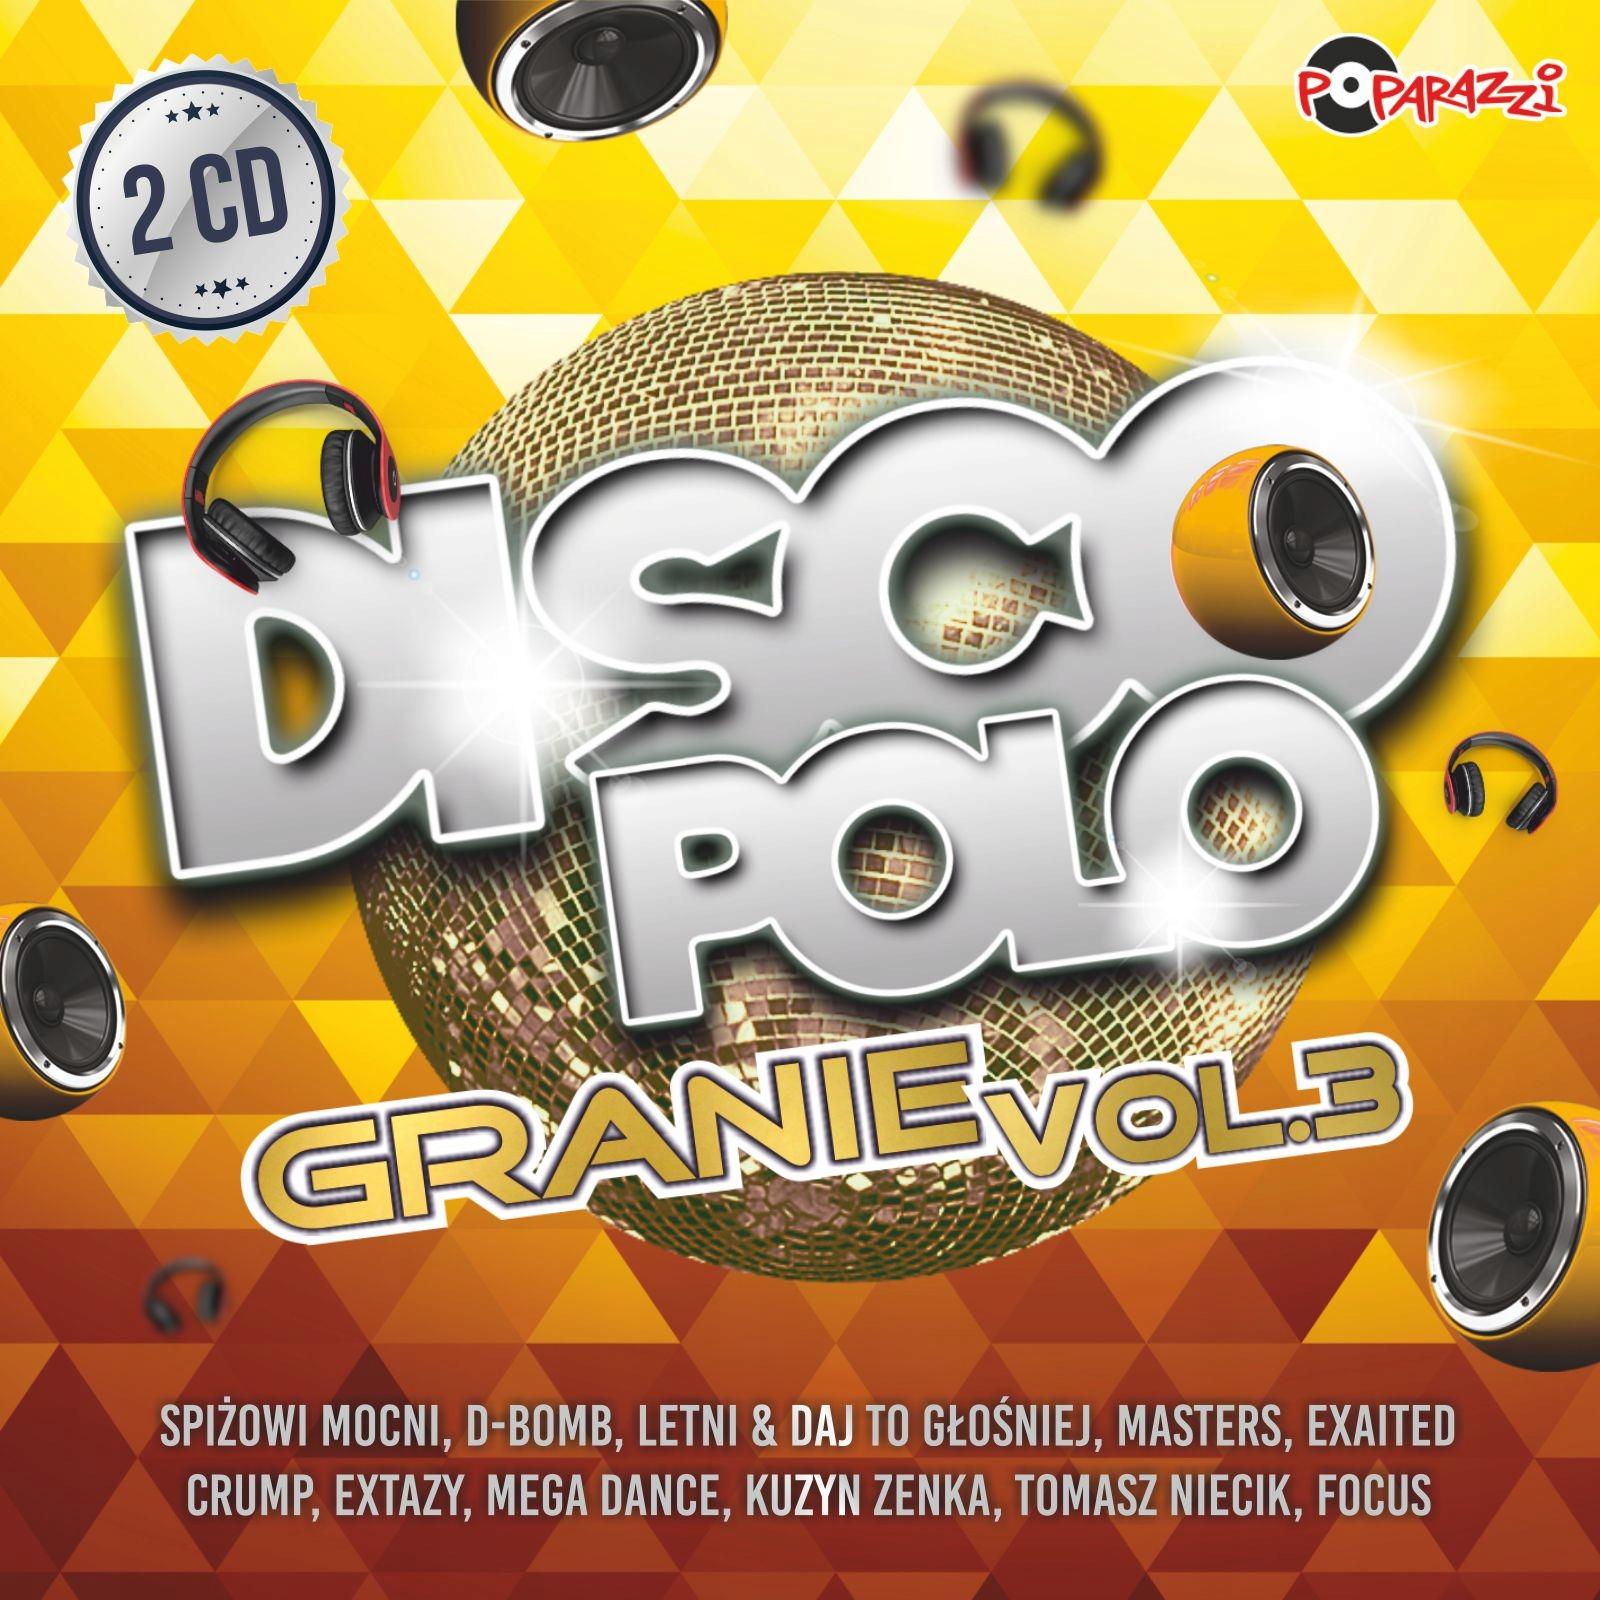 Item Medley | DISCO POLO PLAY VOL.3 (2CD) - NEW